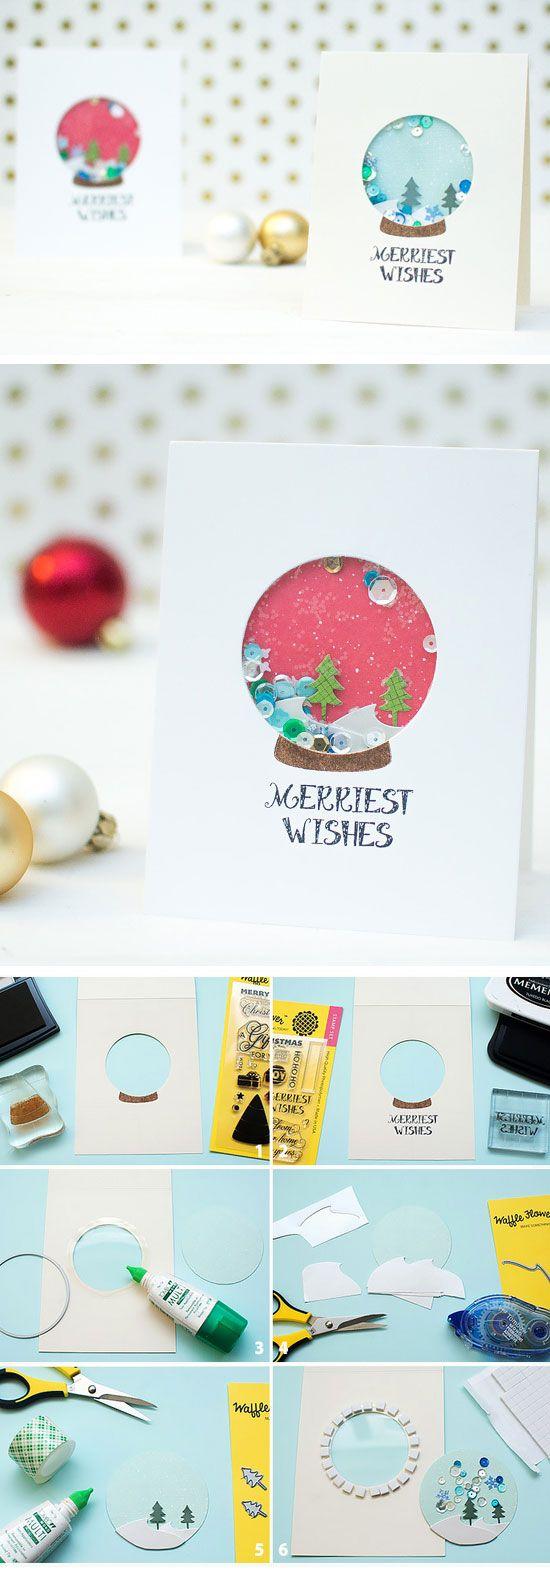 Snow Globe Shaker Cards | Click for 20 DIY Christmas Card Ideas for Families | DIY Christmas Cards for Kids to Make